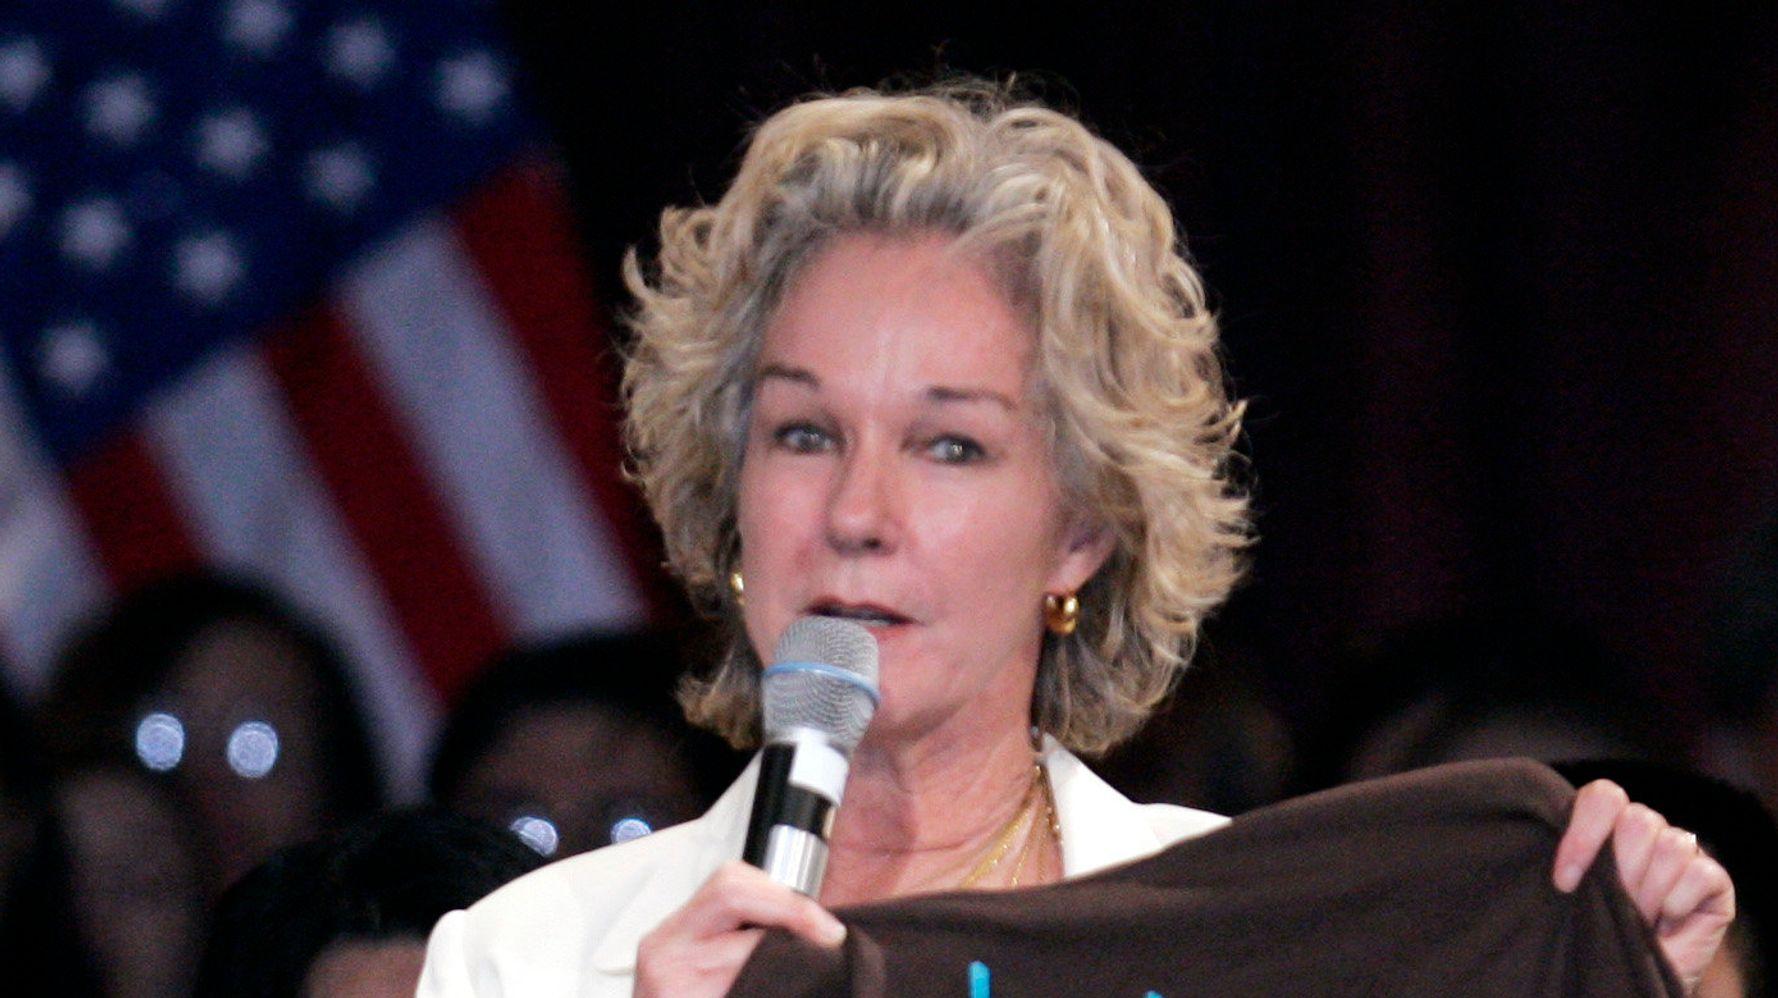 Democratic Donor Who Shunned Kirsten Gillibrand Over Al Franken Backs Kamala Harris Huffpost